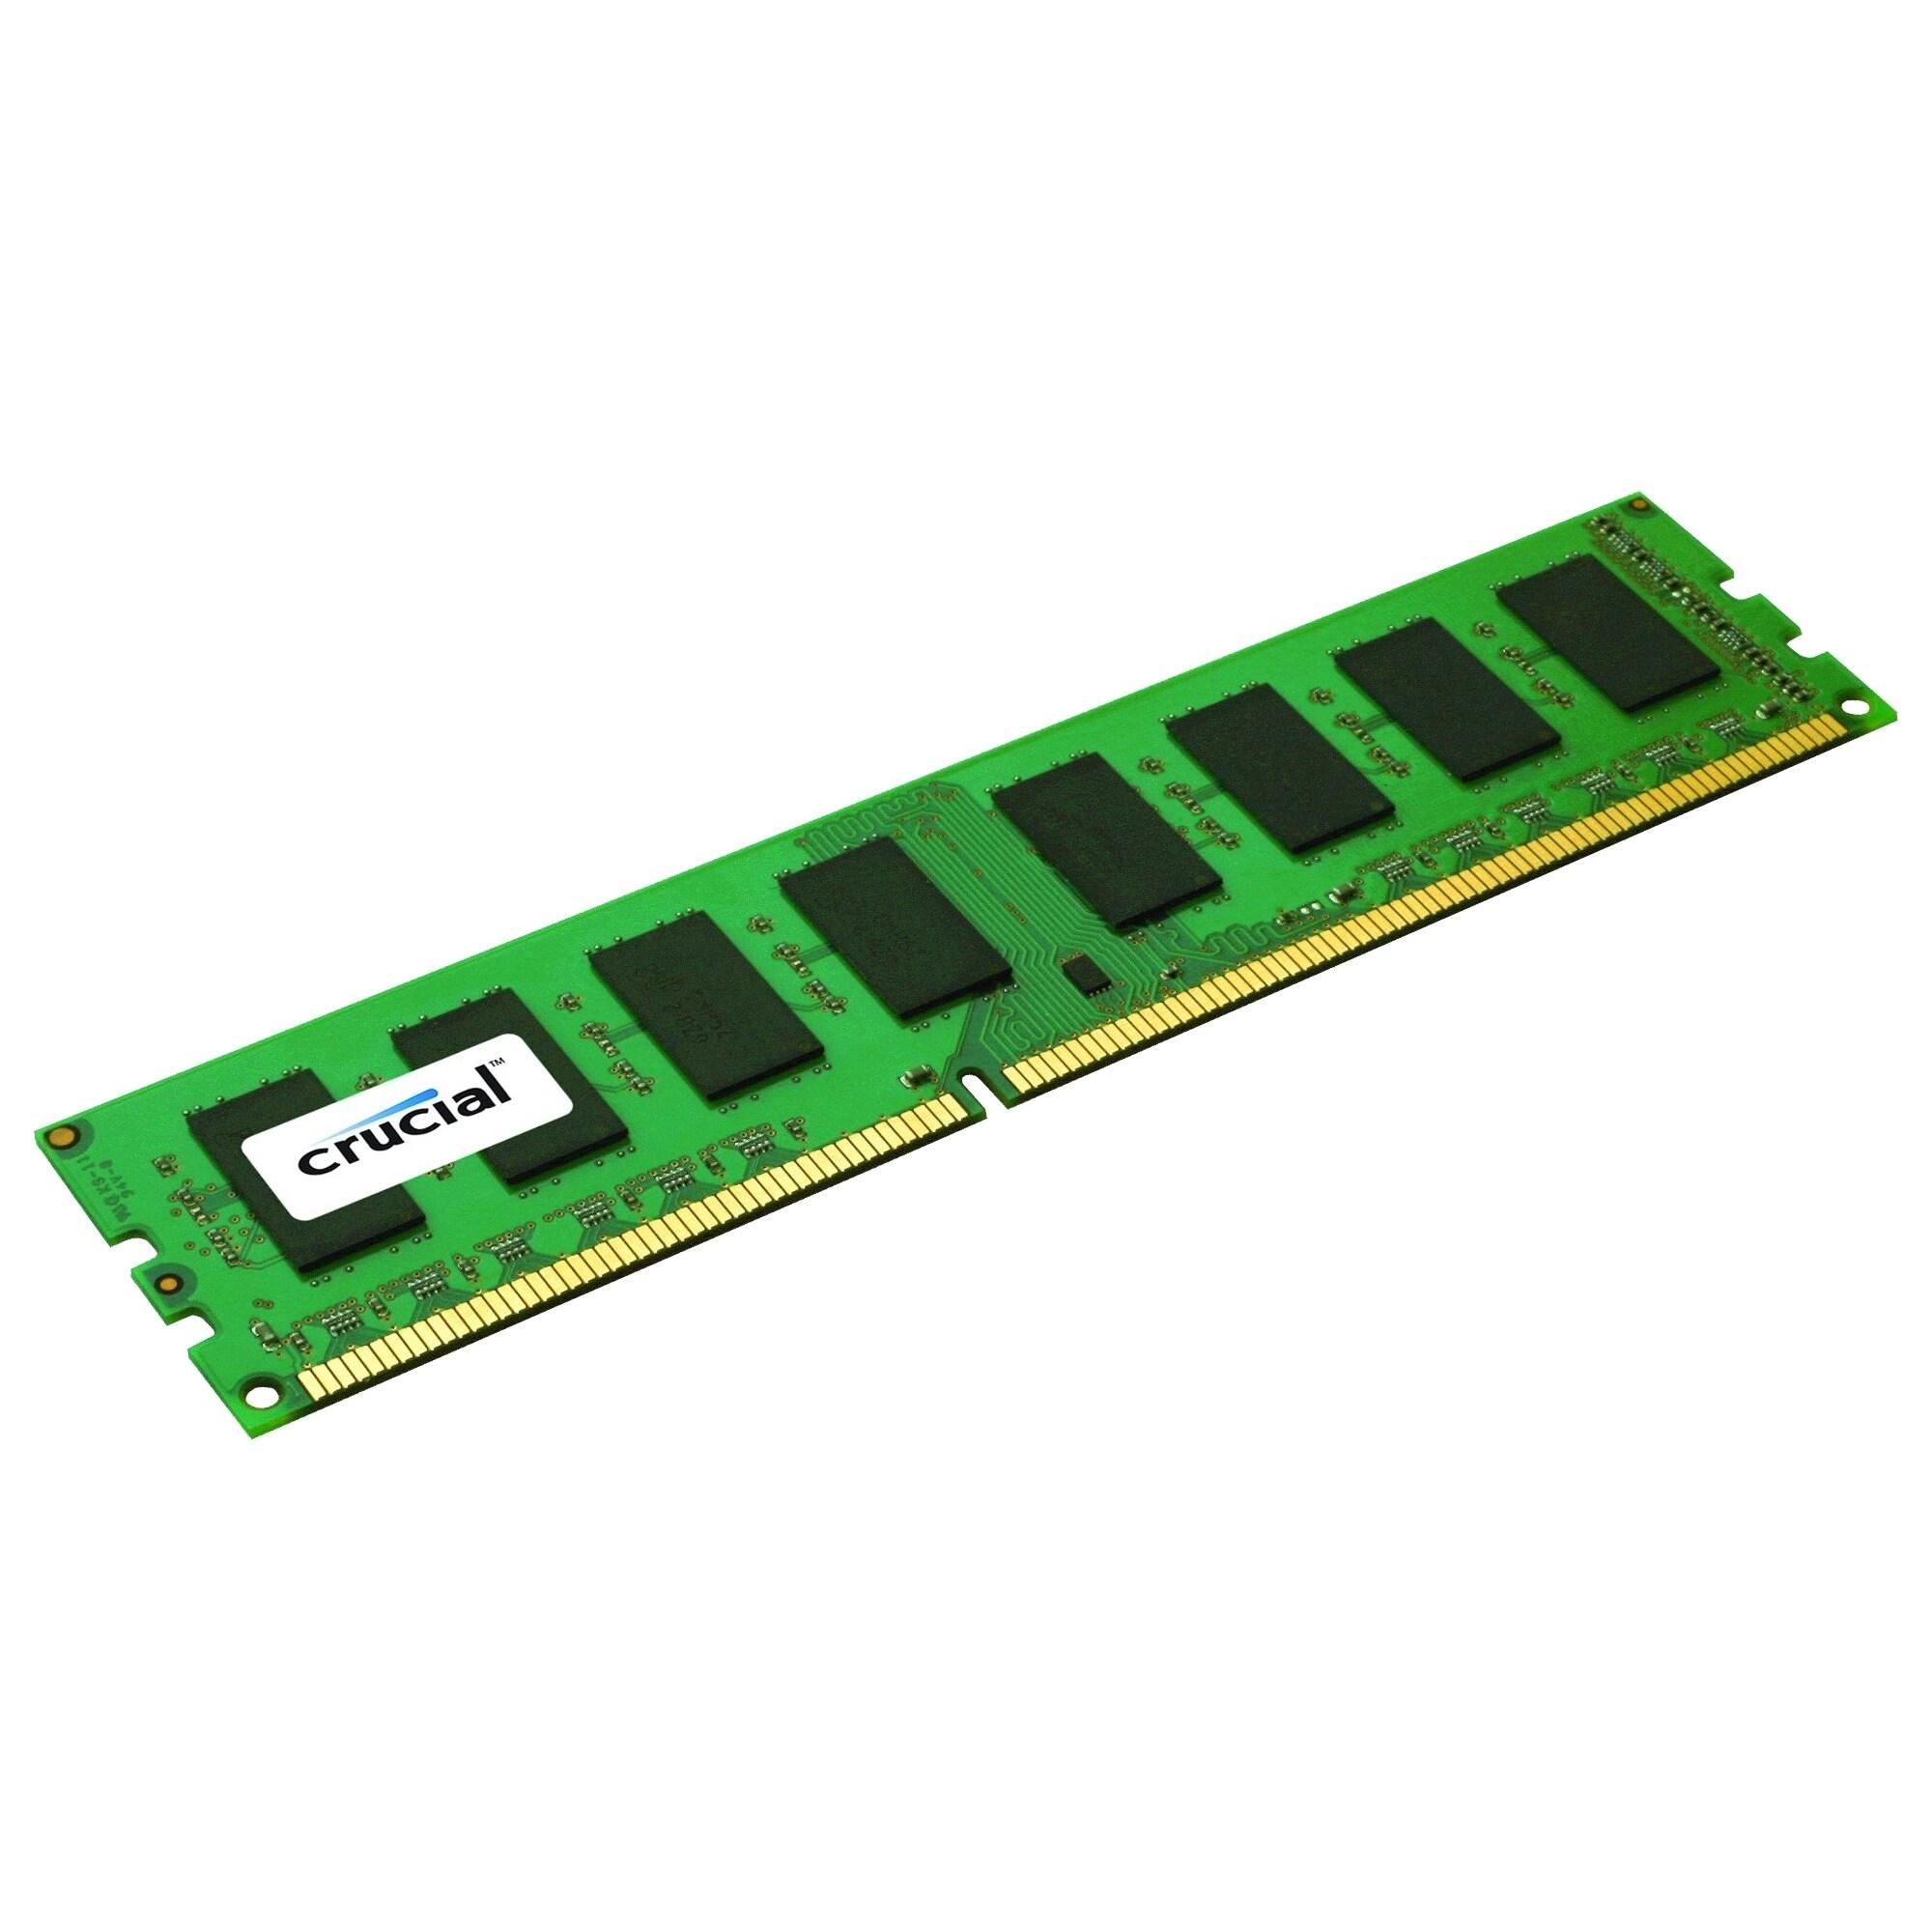 Crucial 8GB, 240-Pin Dimm, DDR3 PC3-12800 Memory Module, ...